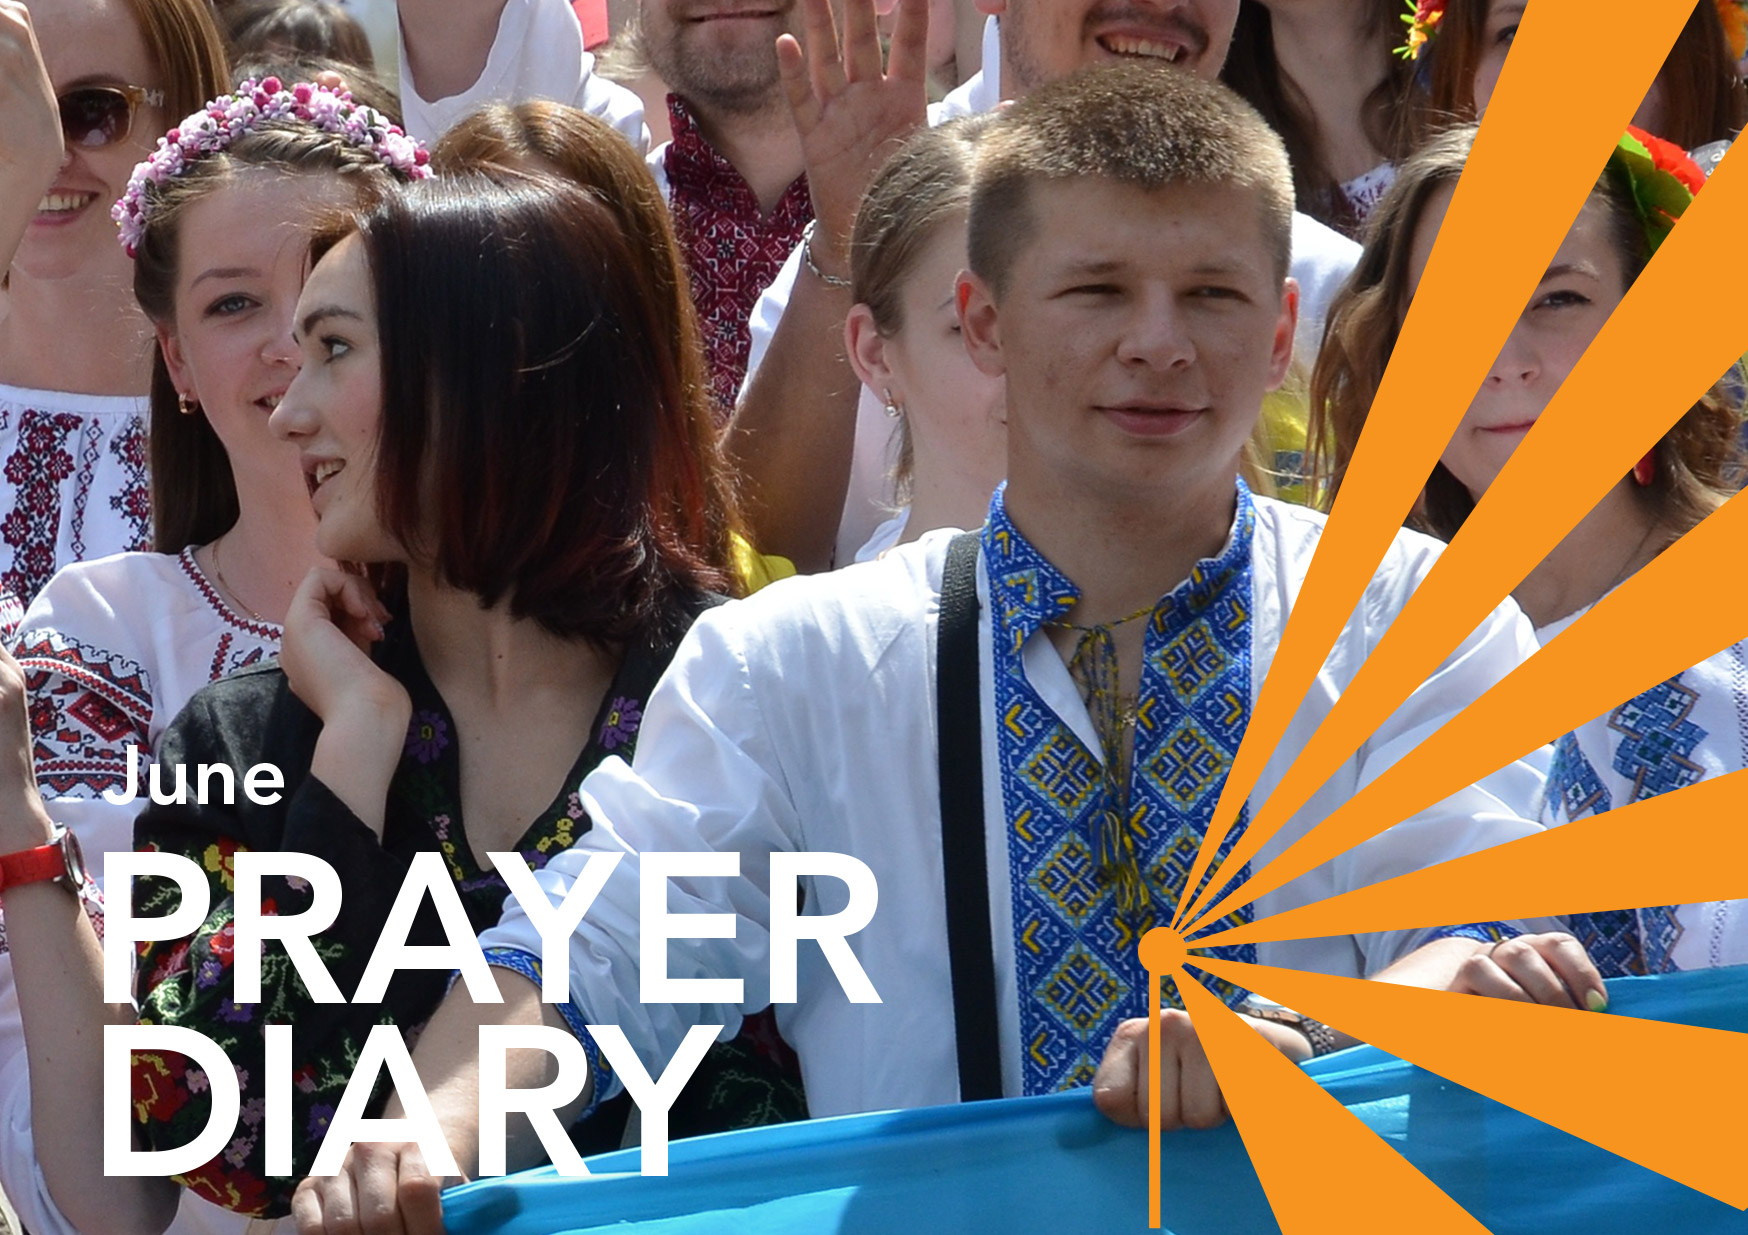 Prayer-Diary-June